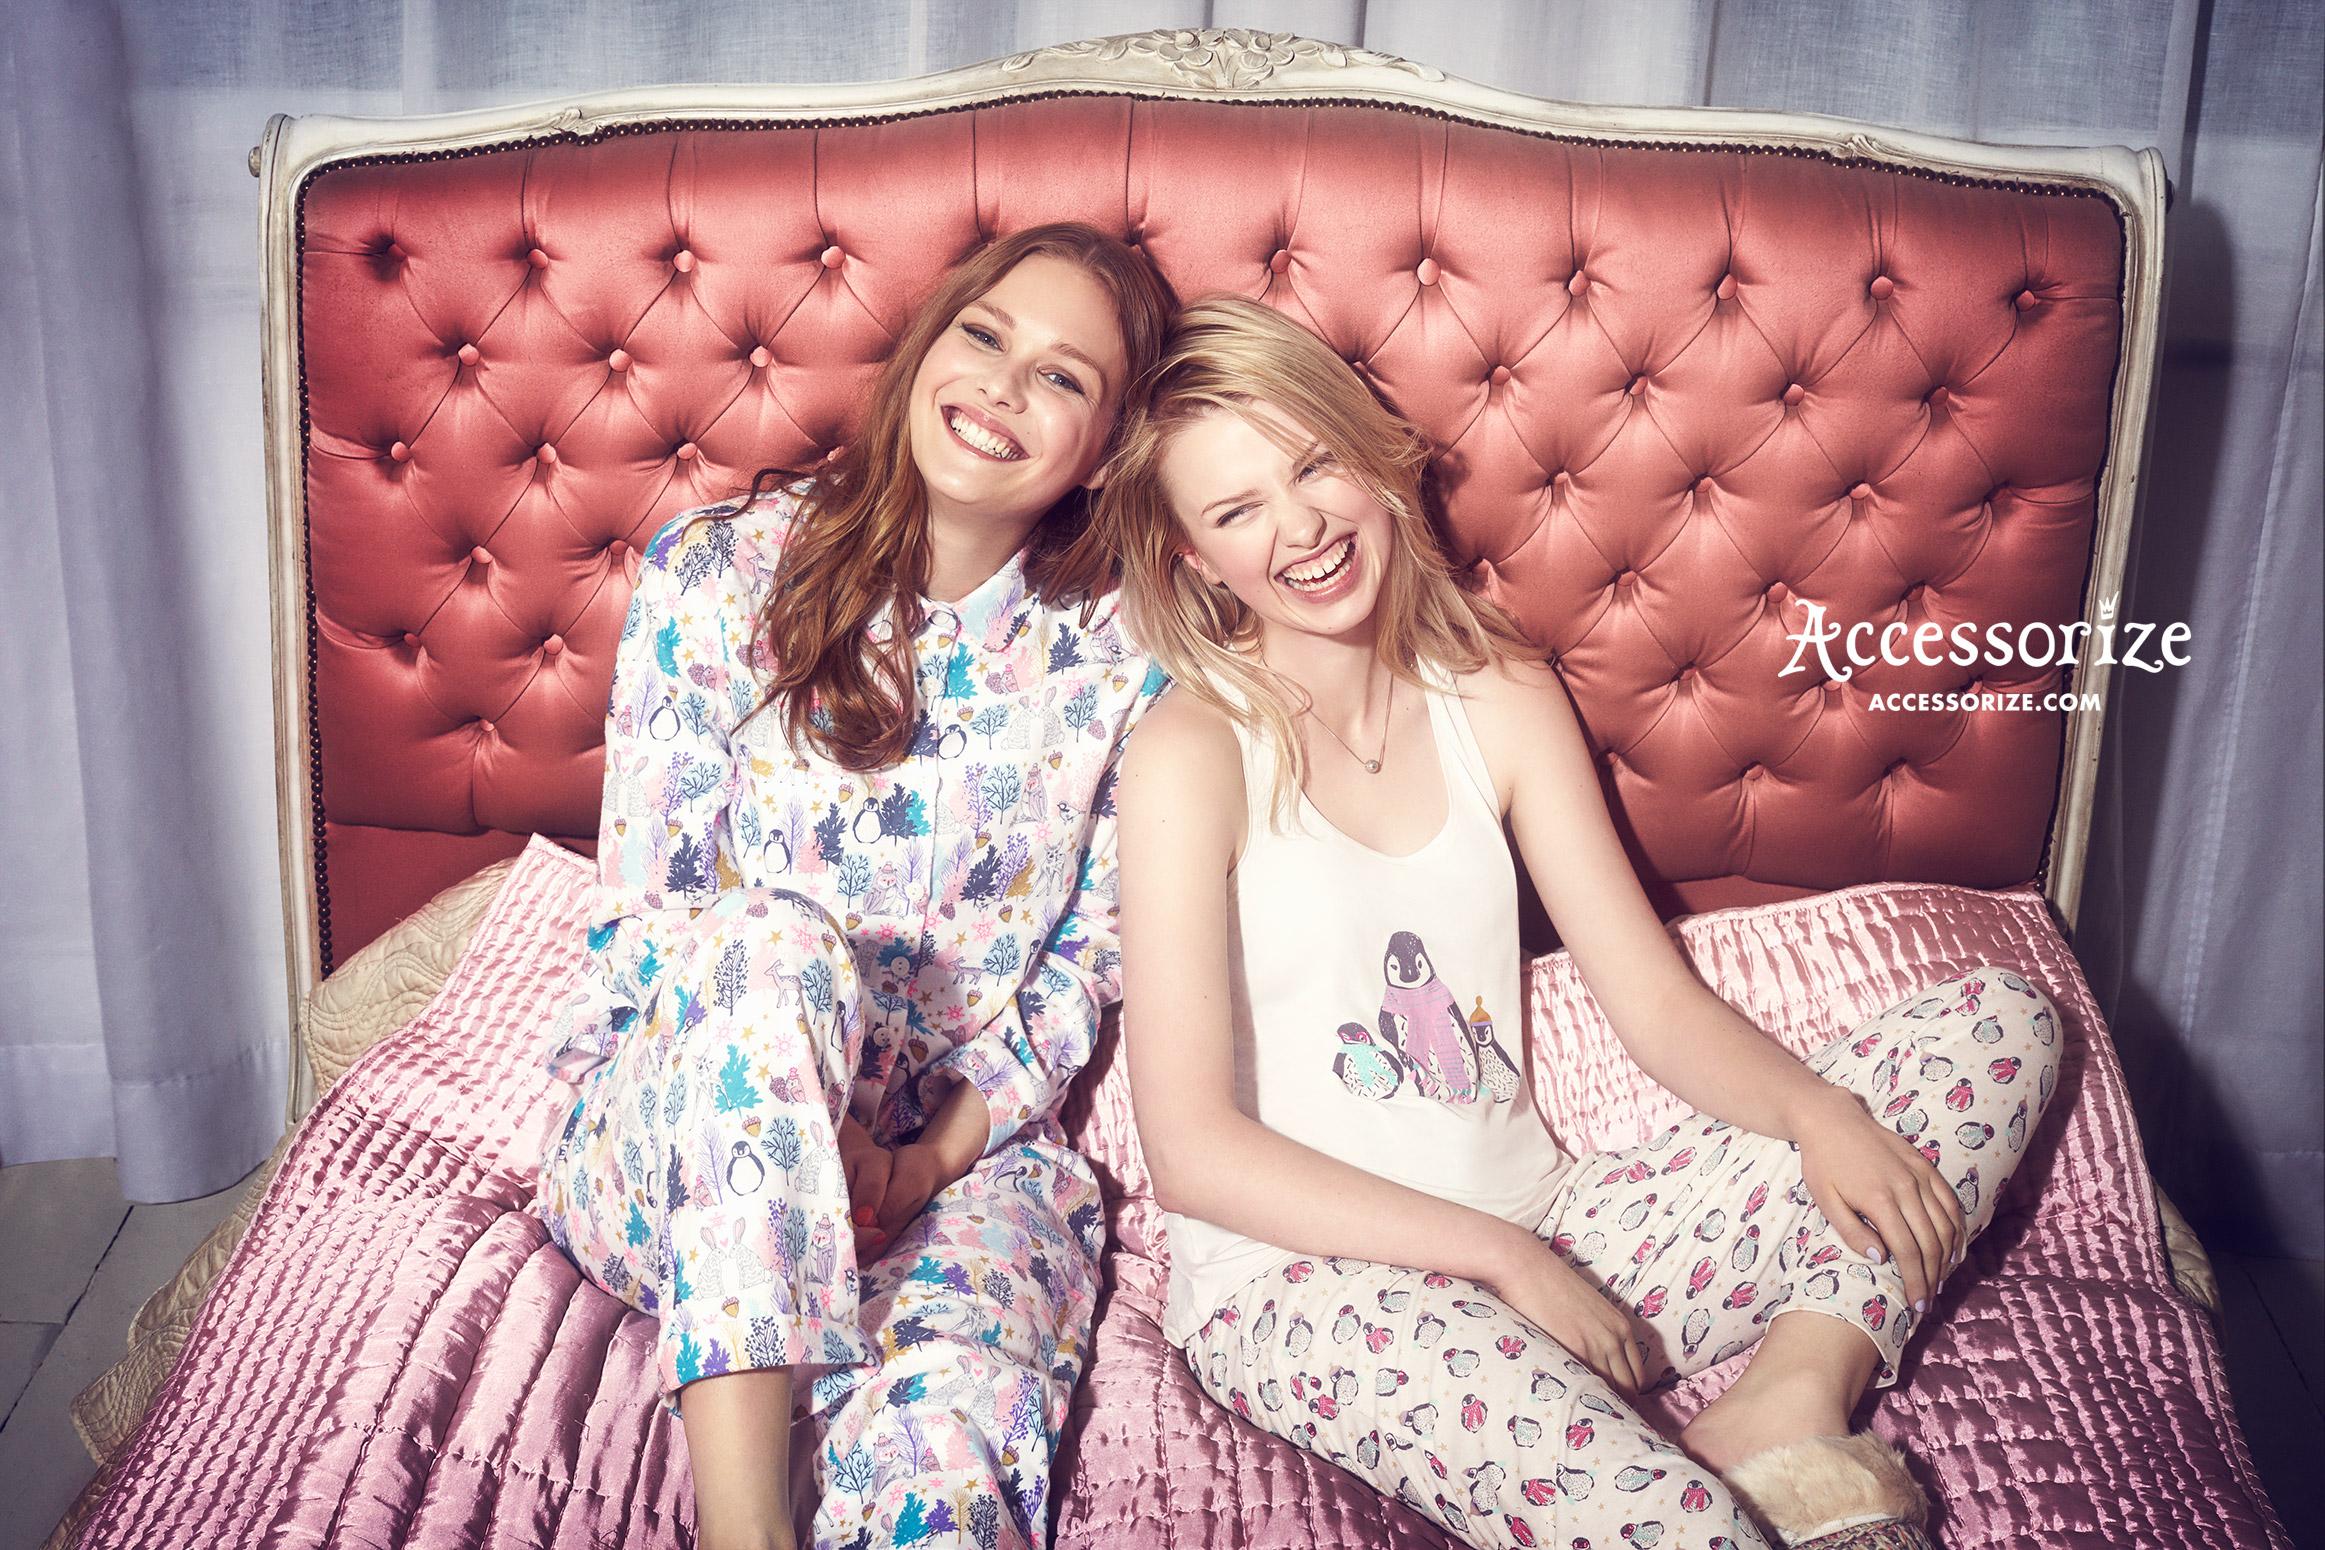 accessorize-campaign-sleepwear-sleepover-pijamas-ruth-rose-lorship-park-6 copy.jpg